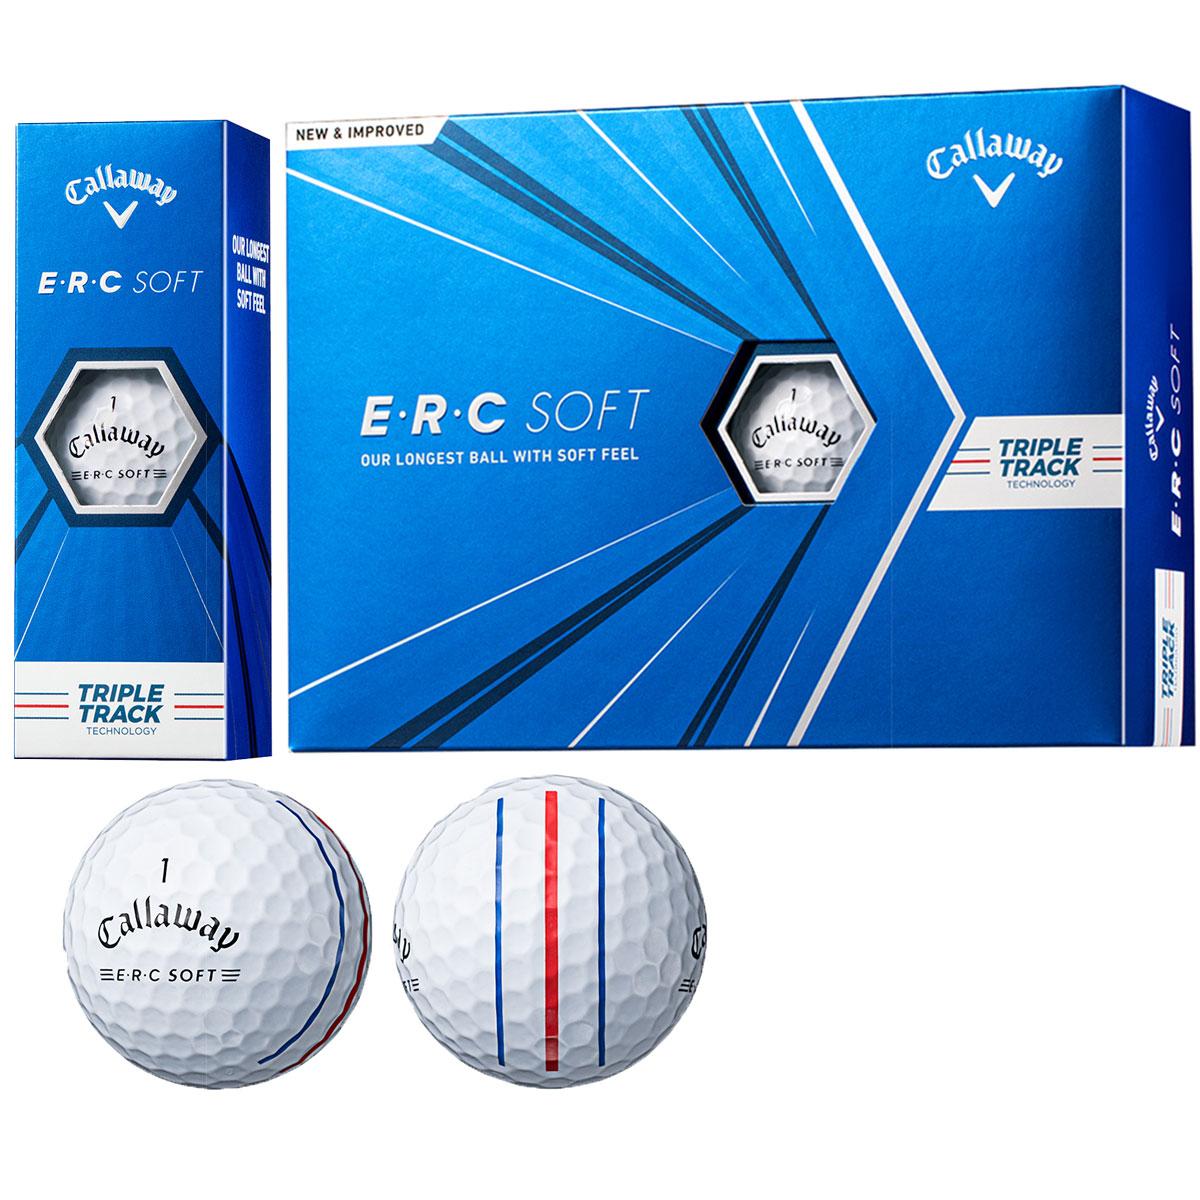 ERC SOFT 21 TRIPLE TRACKボール【2021年4月下旬発売予定】